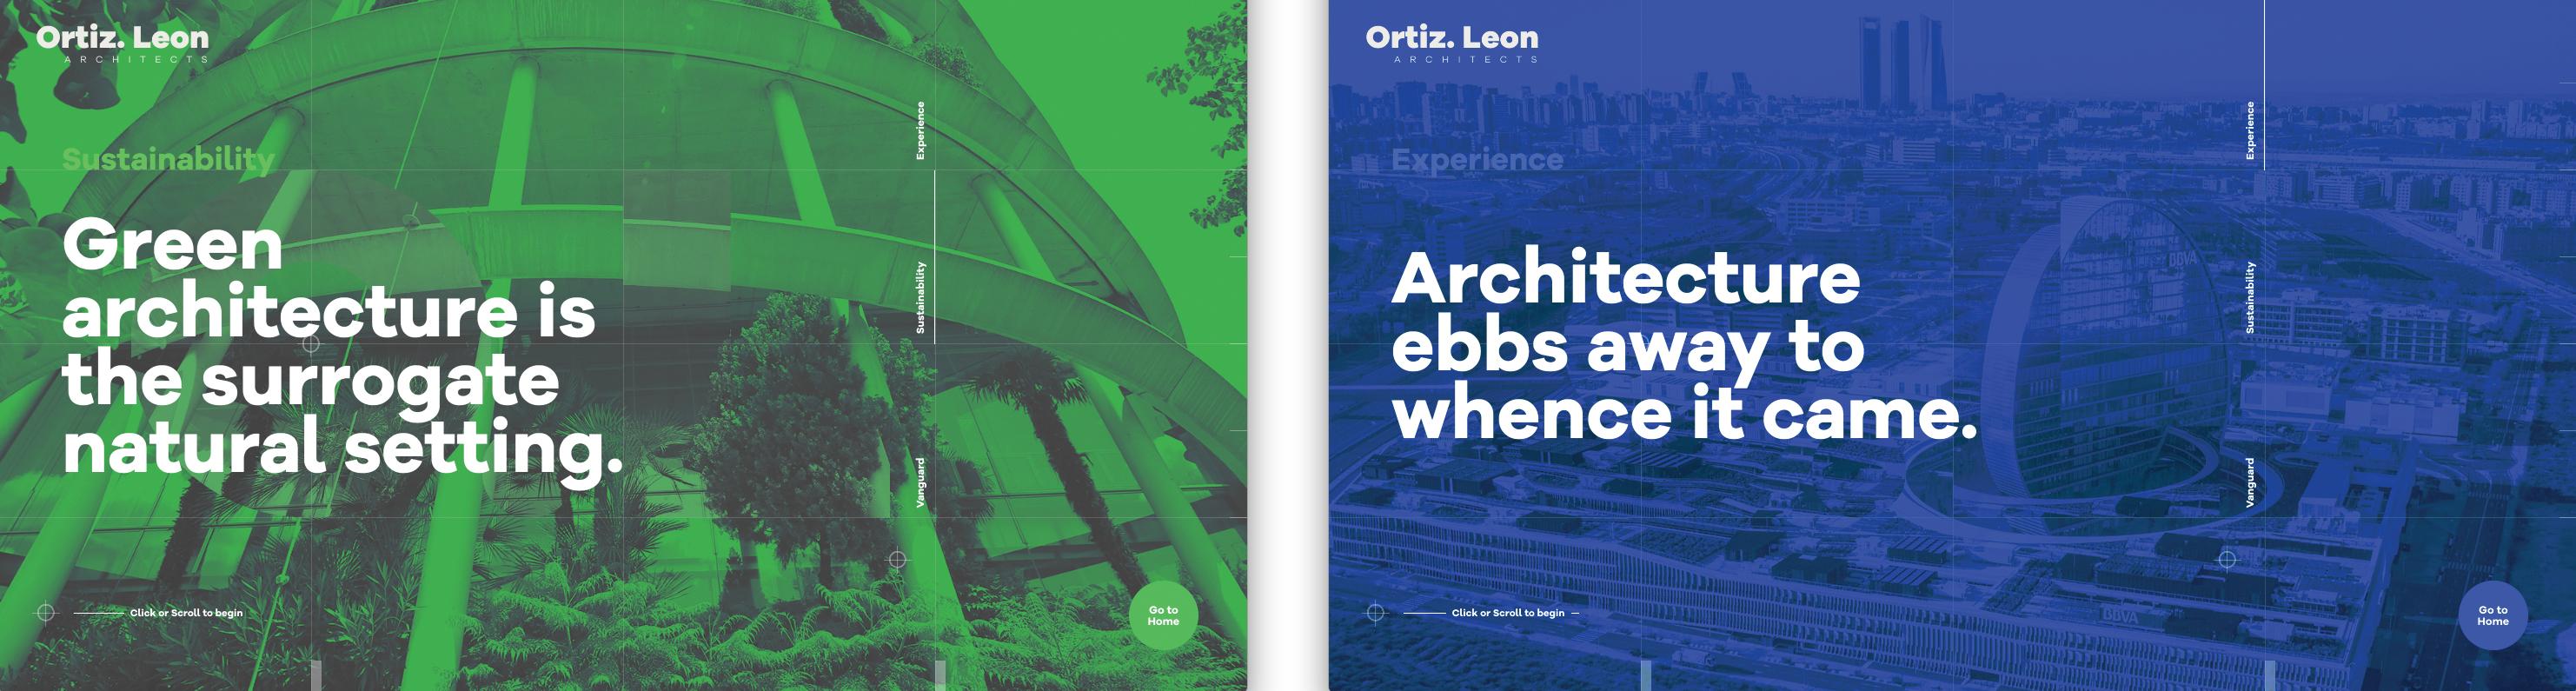 CSS tricks: Ortiz Leon Architects  website CSS